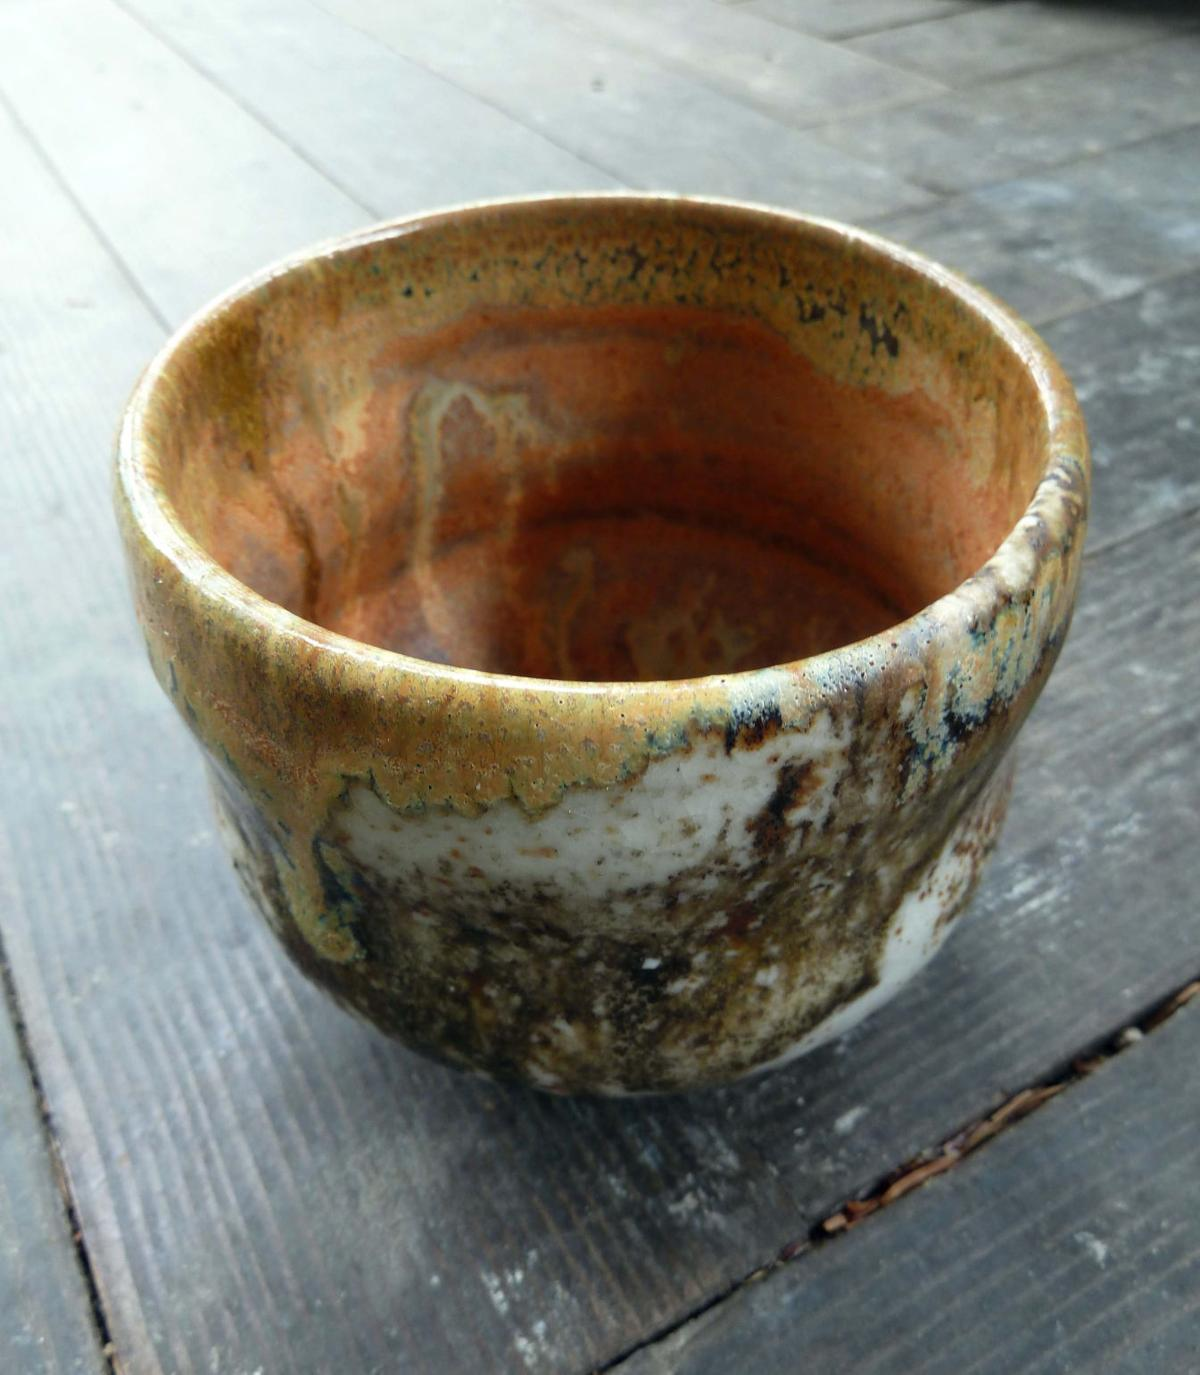 CLOSE TO HOME Art is a tea bowl